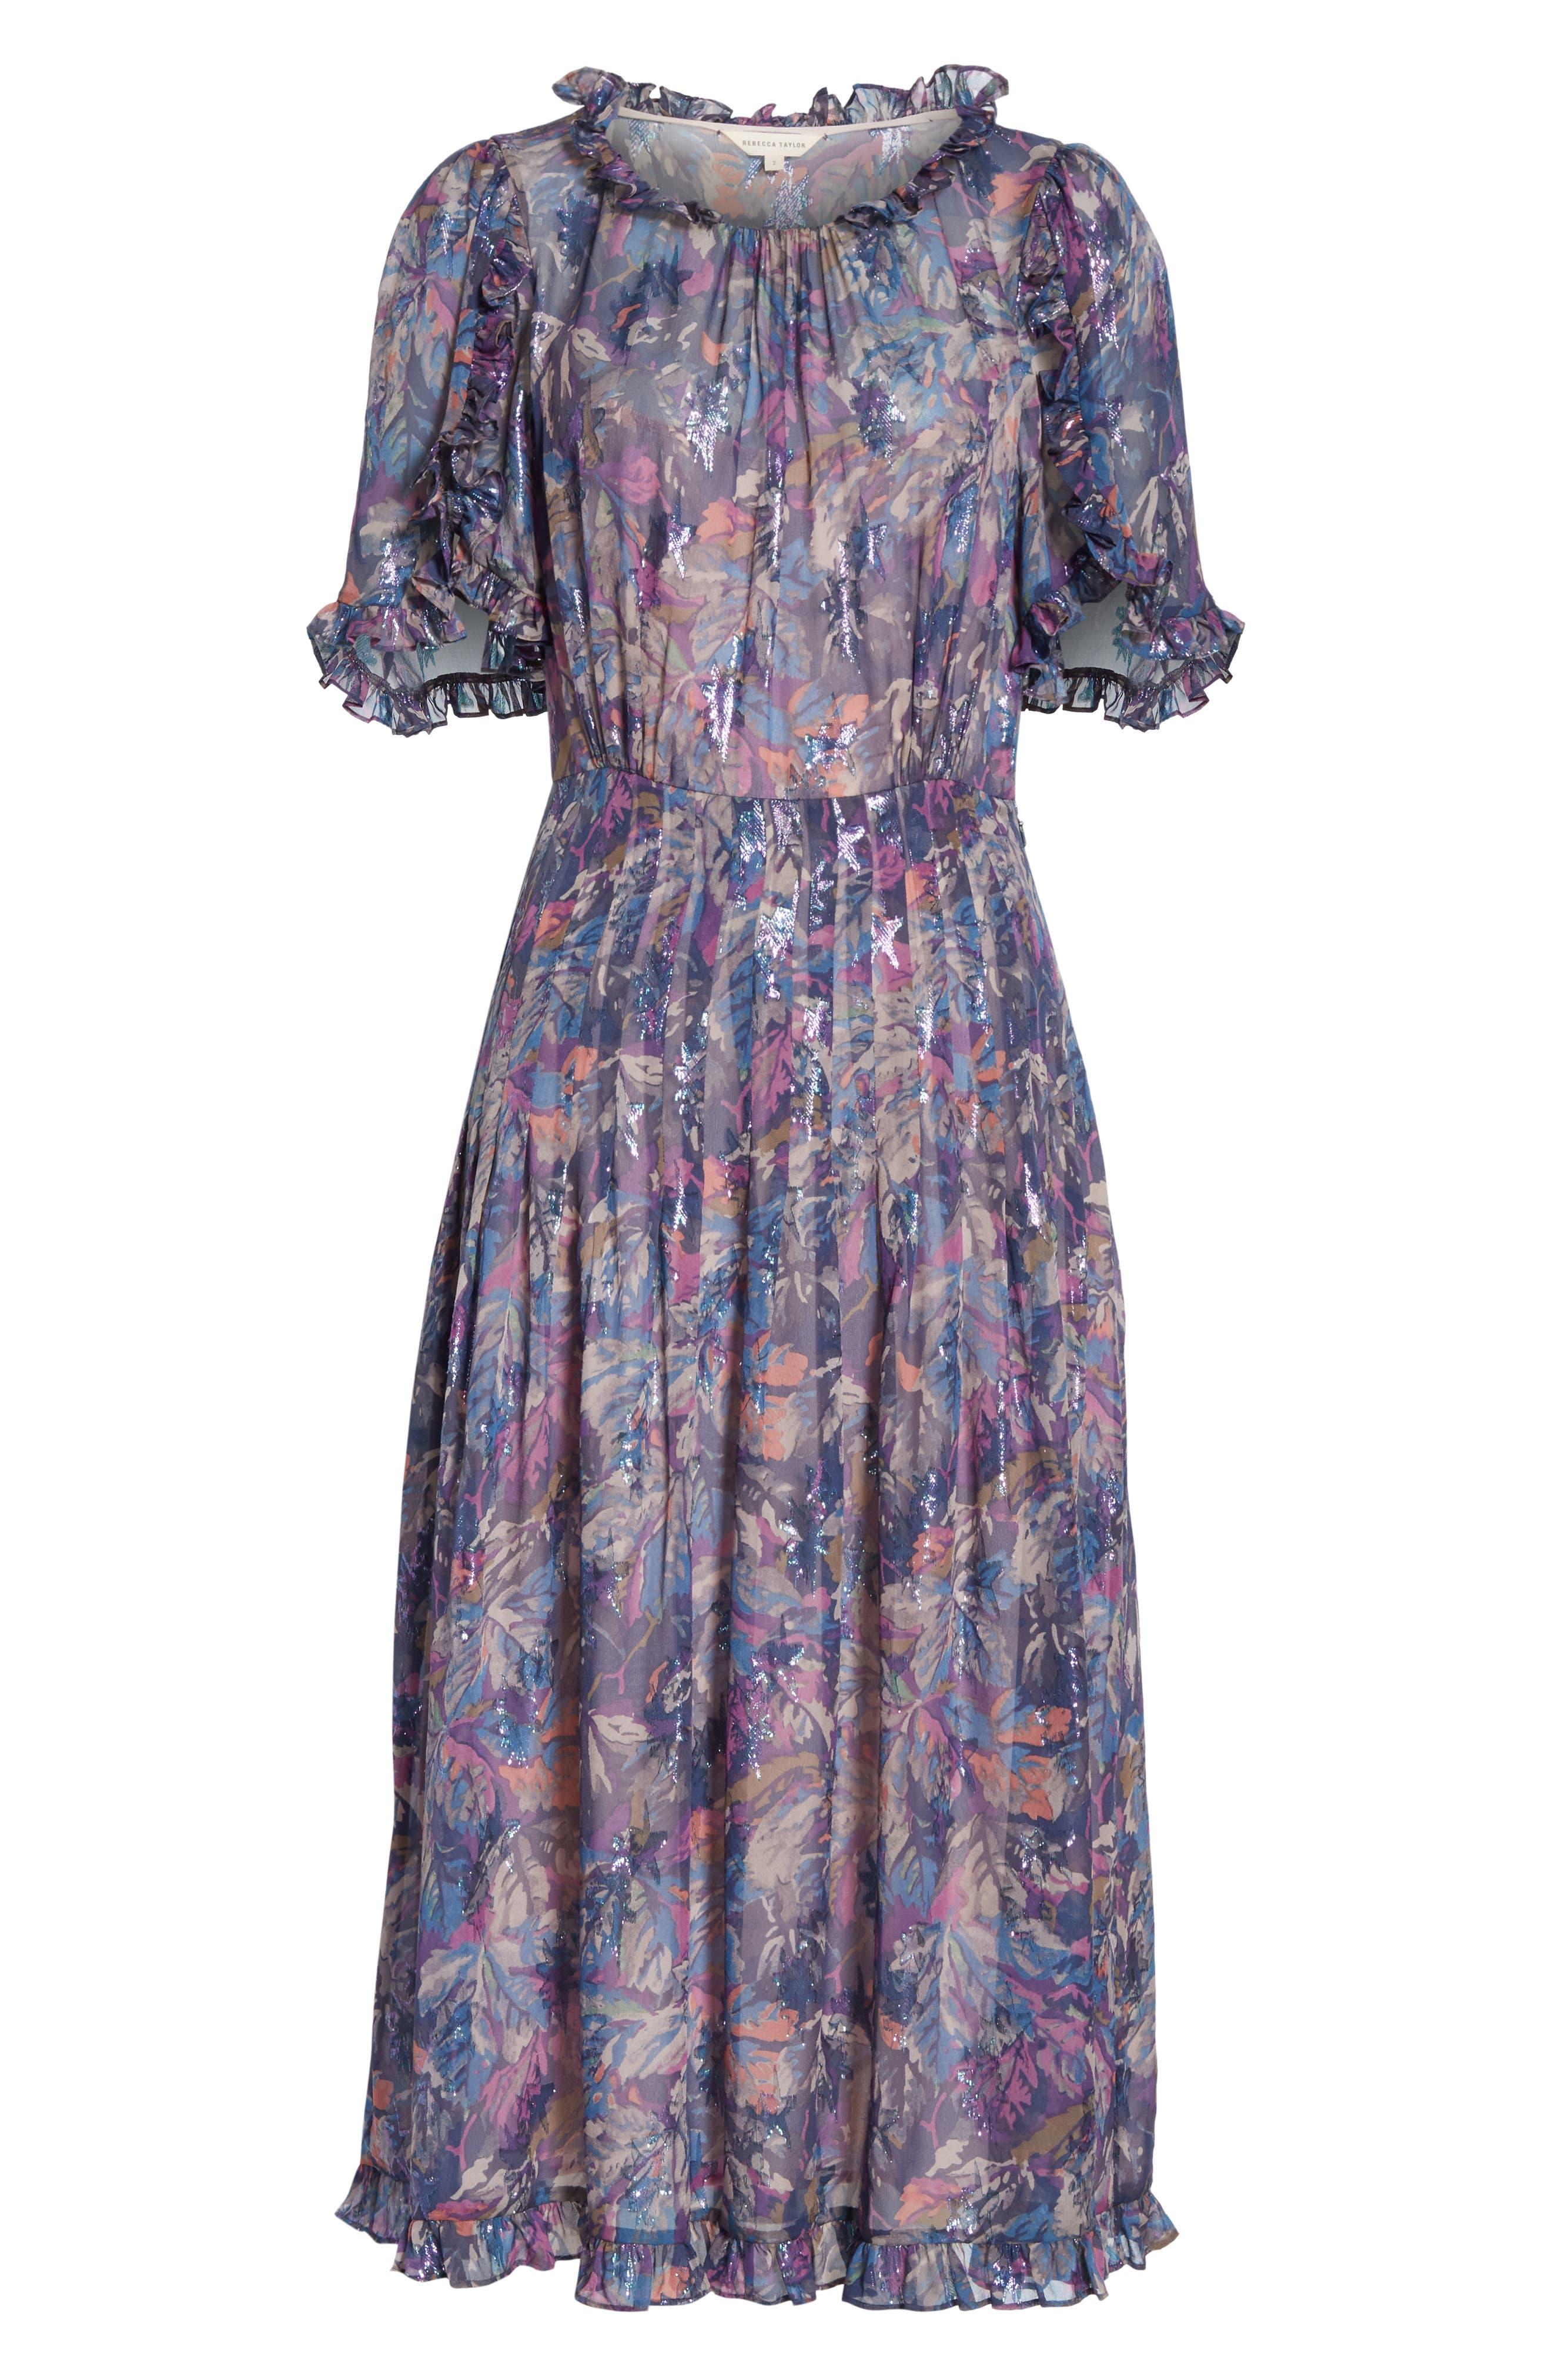 Giverny Metallic Detail Silk Chiffon Dress,                             Alternate thumbnail 6, color,                             AMETHYST COMBO